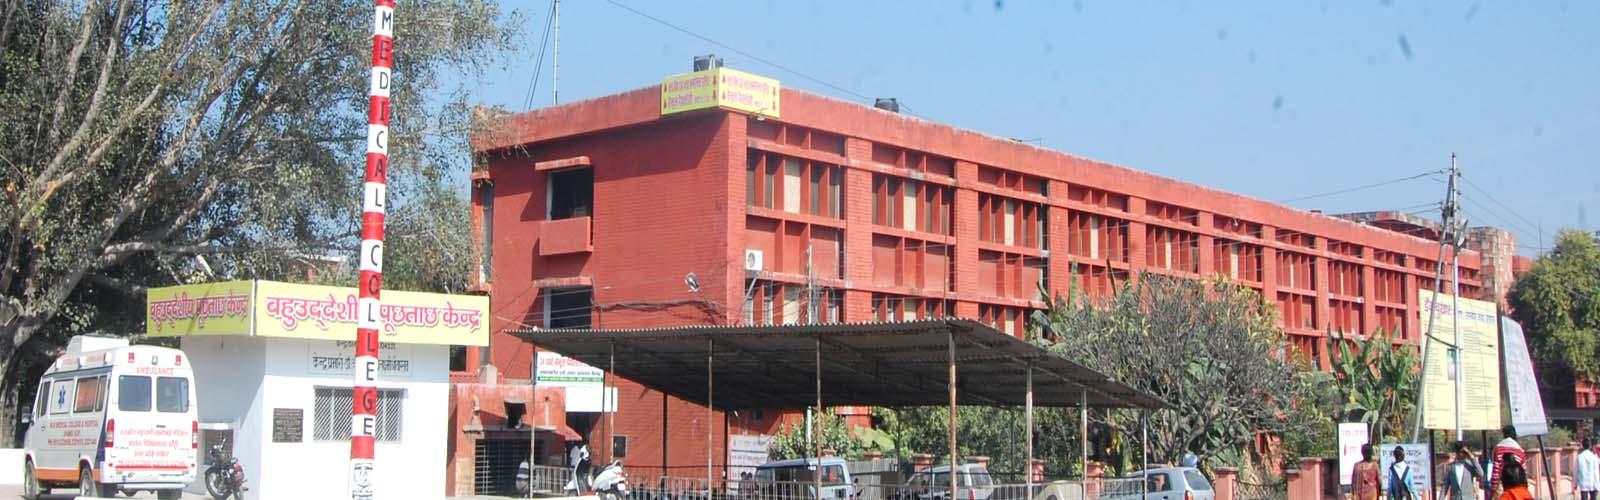 maharani laxmi bai medical college admissions contact website